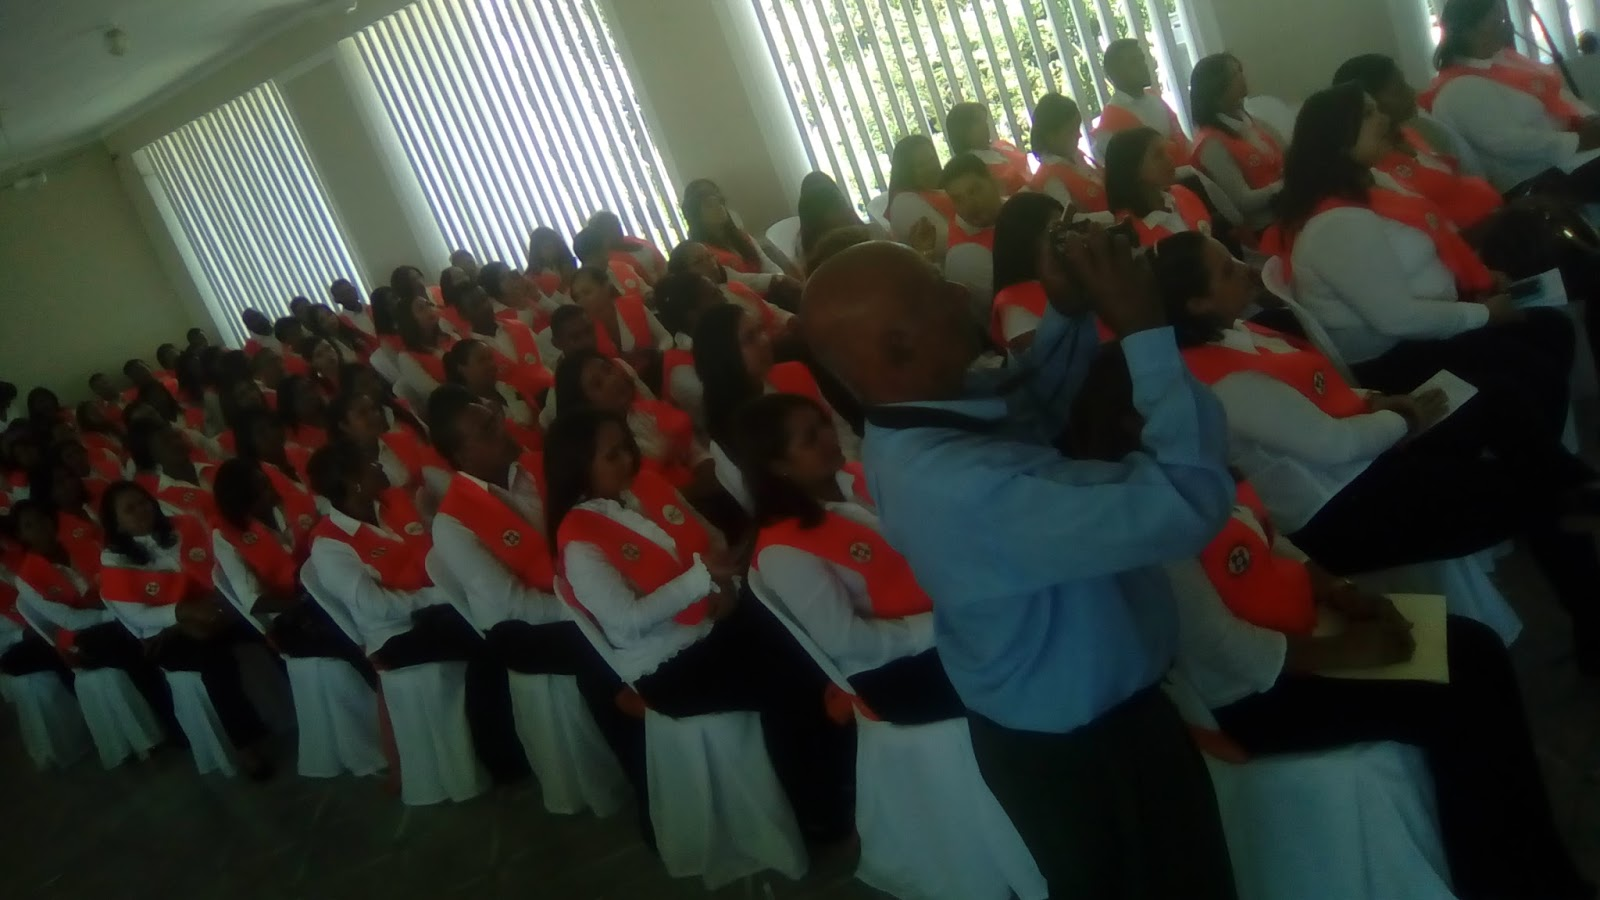 Karamva Centro De Formaci N T Cnica Boanerge Grad A Cien Nuevos  # Muebles En Nagua Republica Dominicana